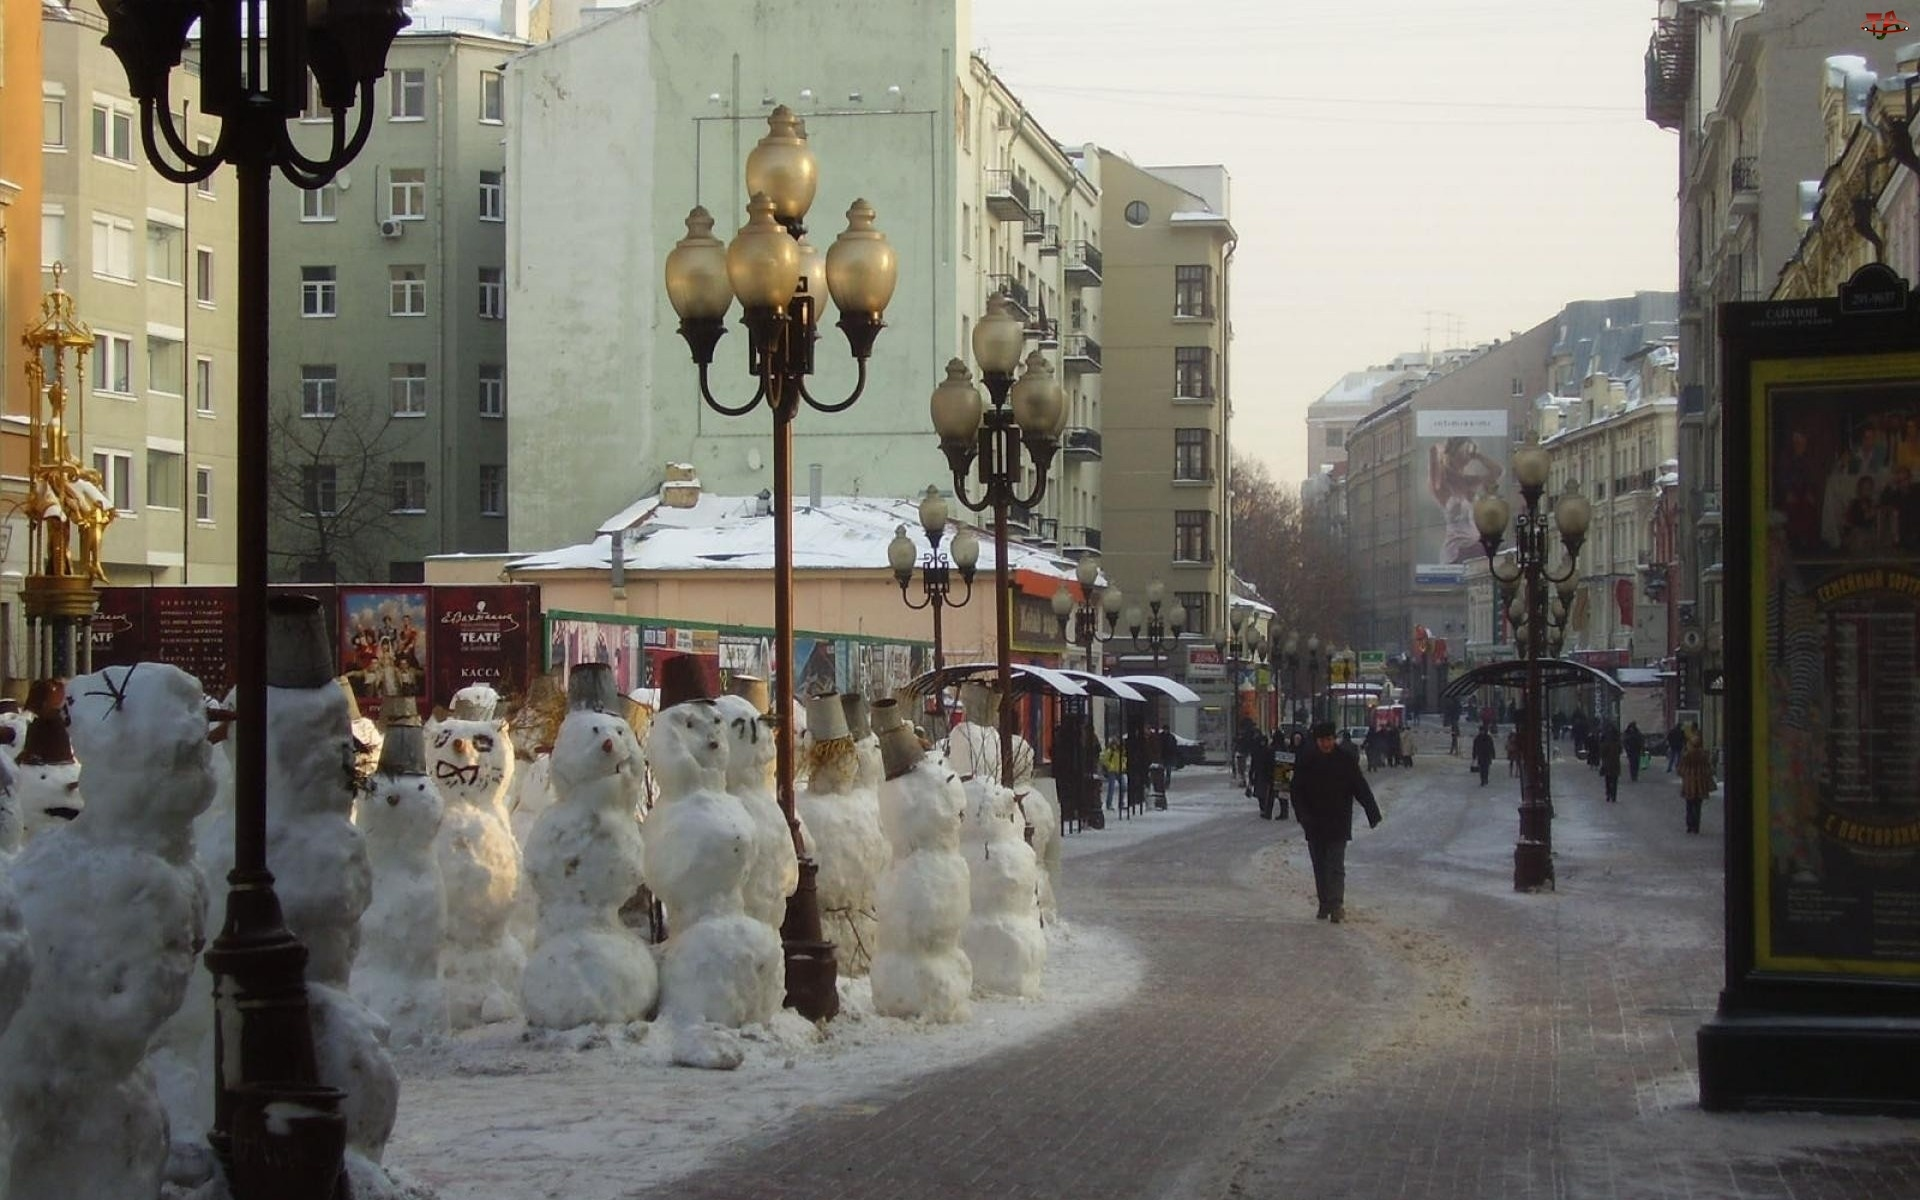 Ulica, Miasto, Latarnie, Bałwanki